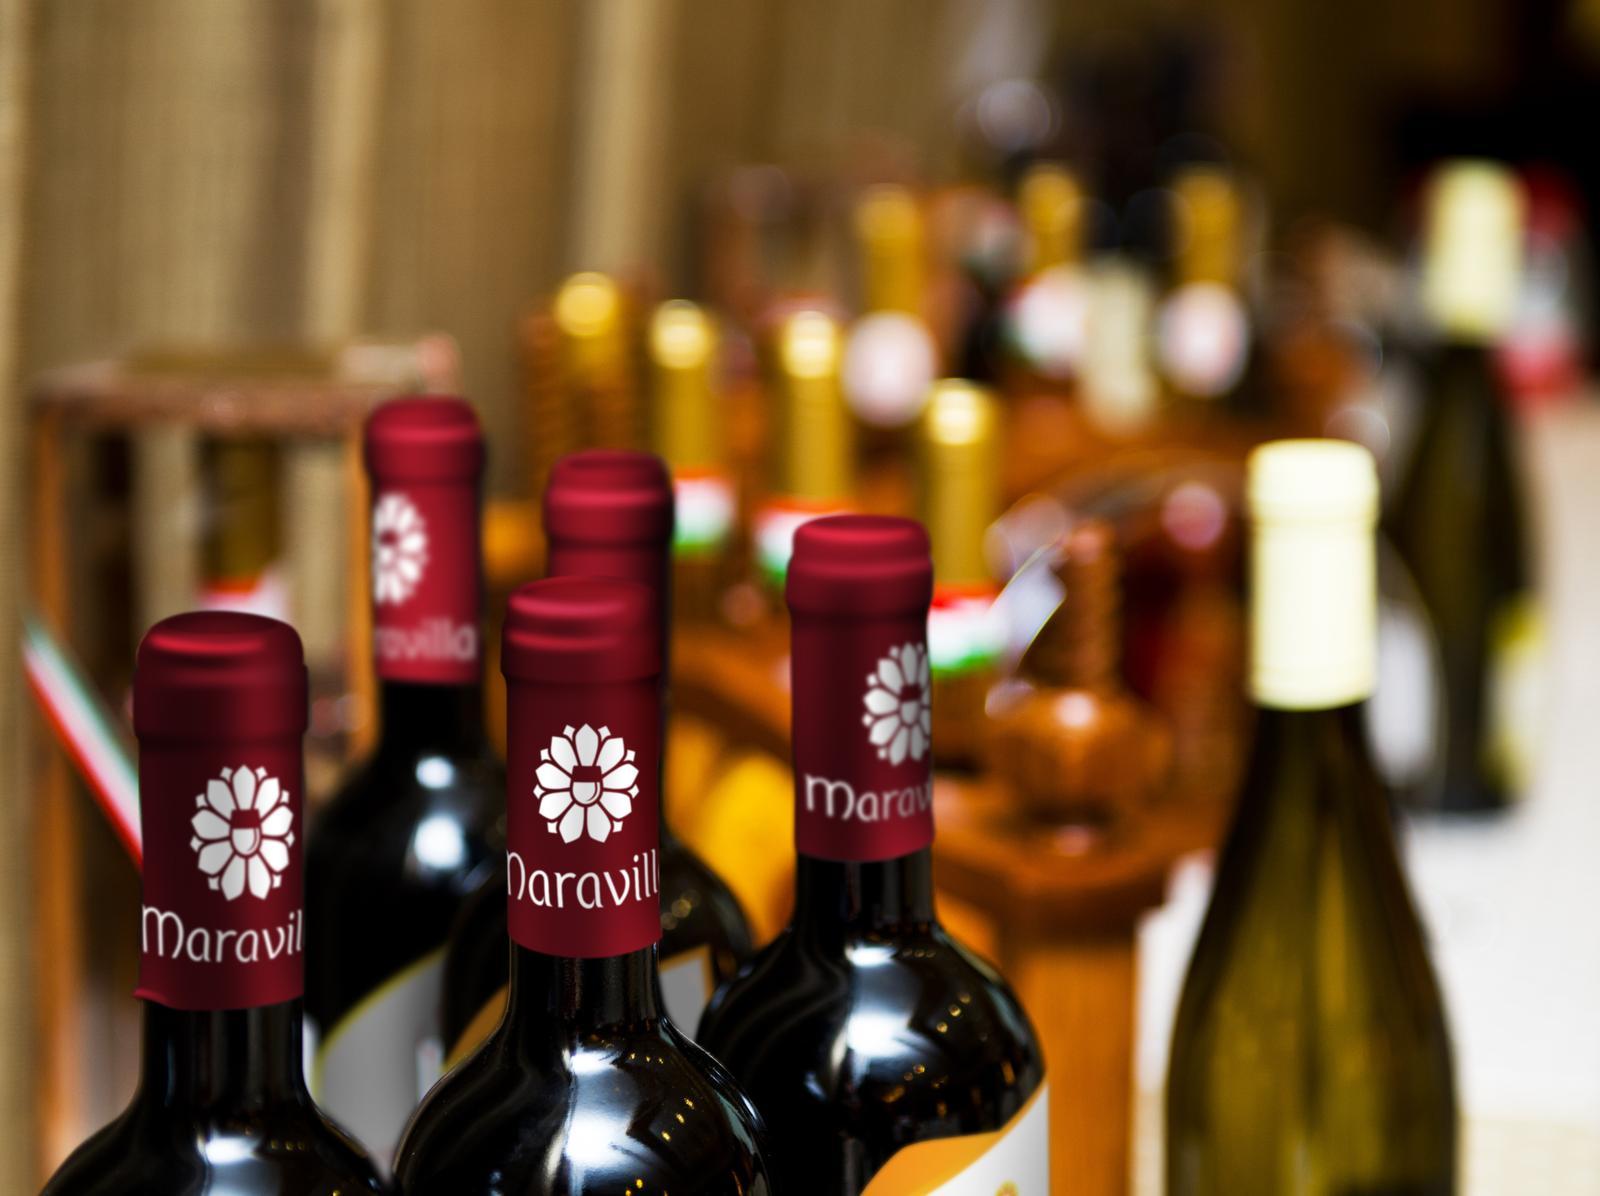 vinomaravilla - Aby na vašom stole nechýbala originalita